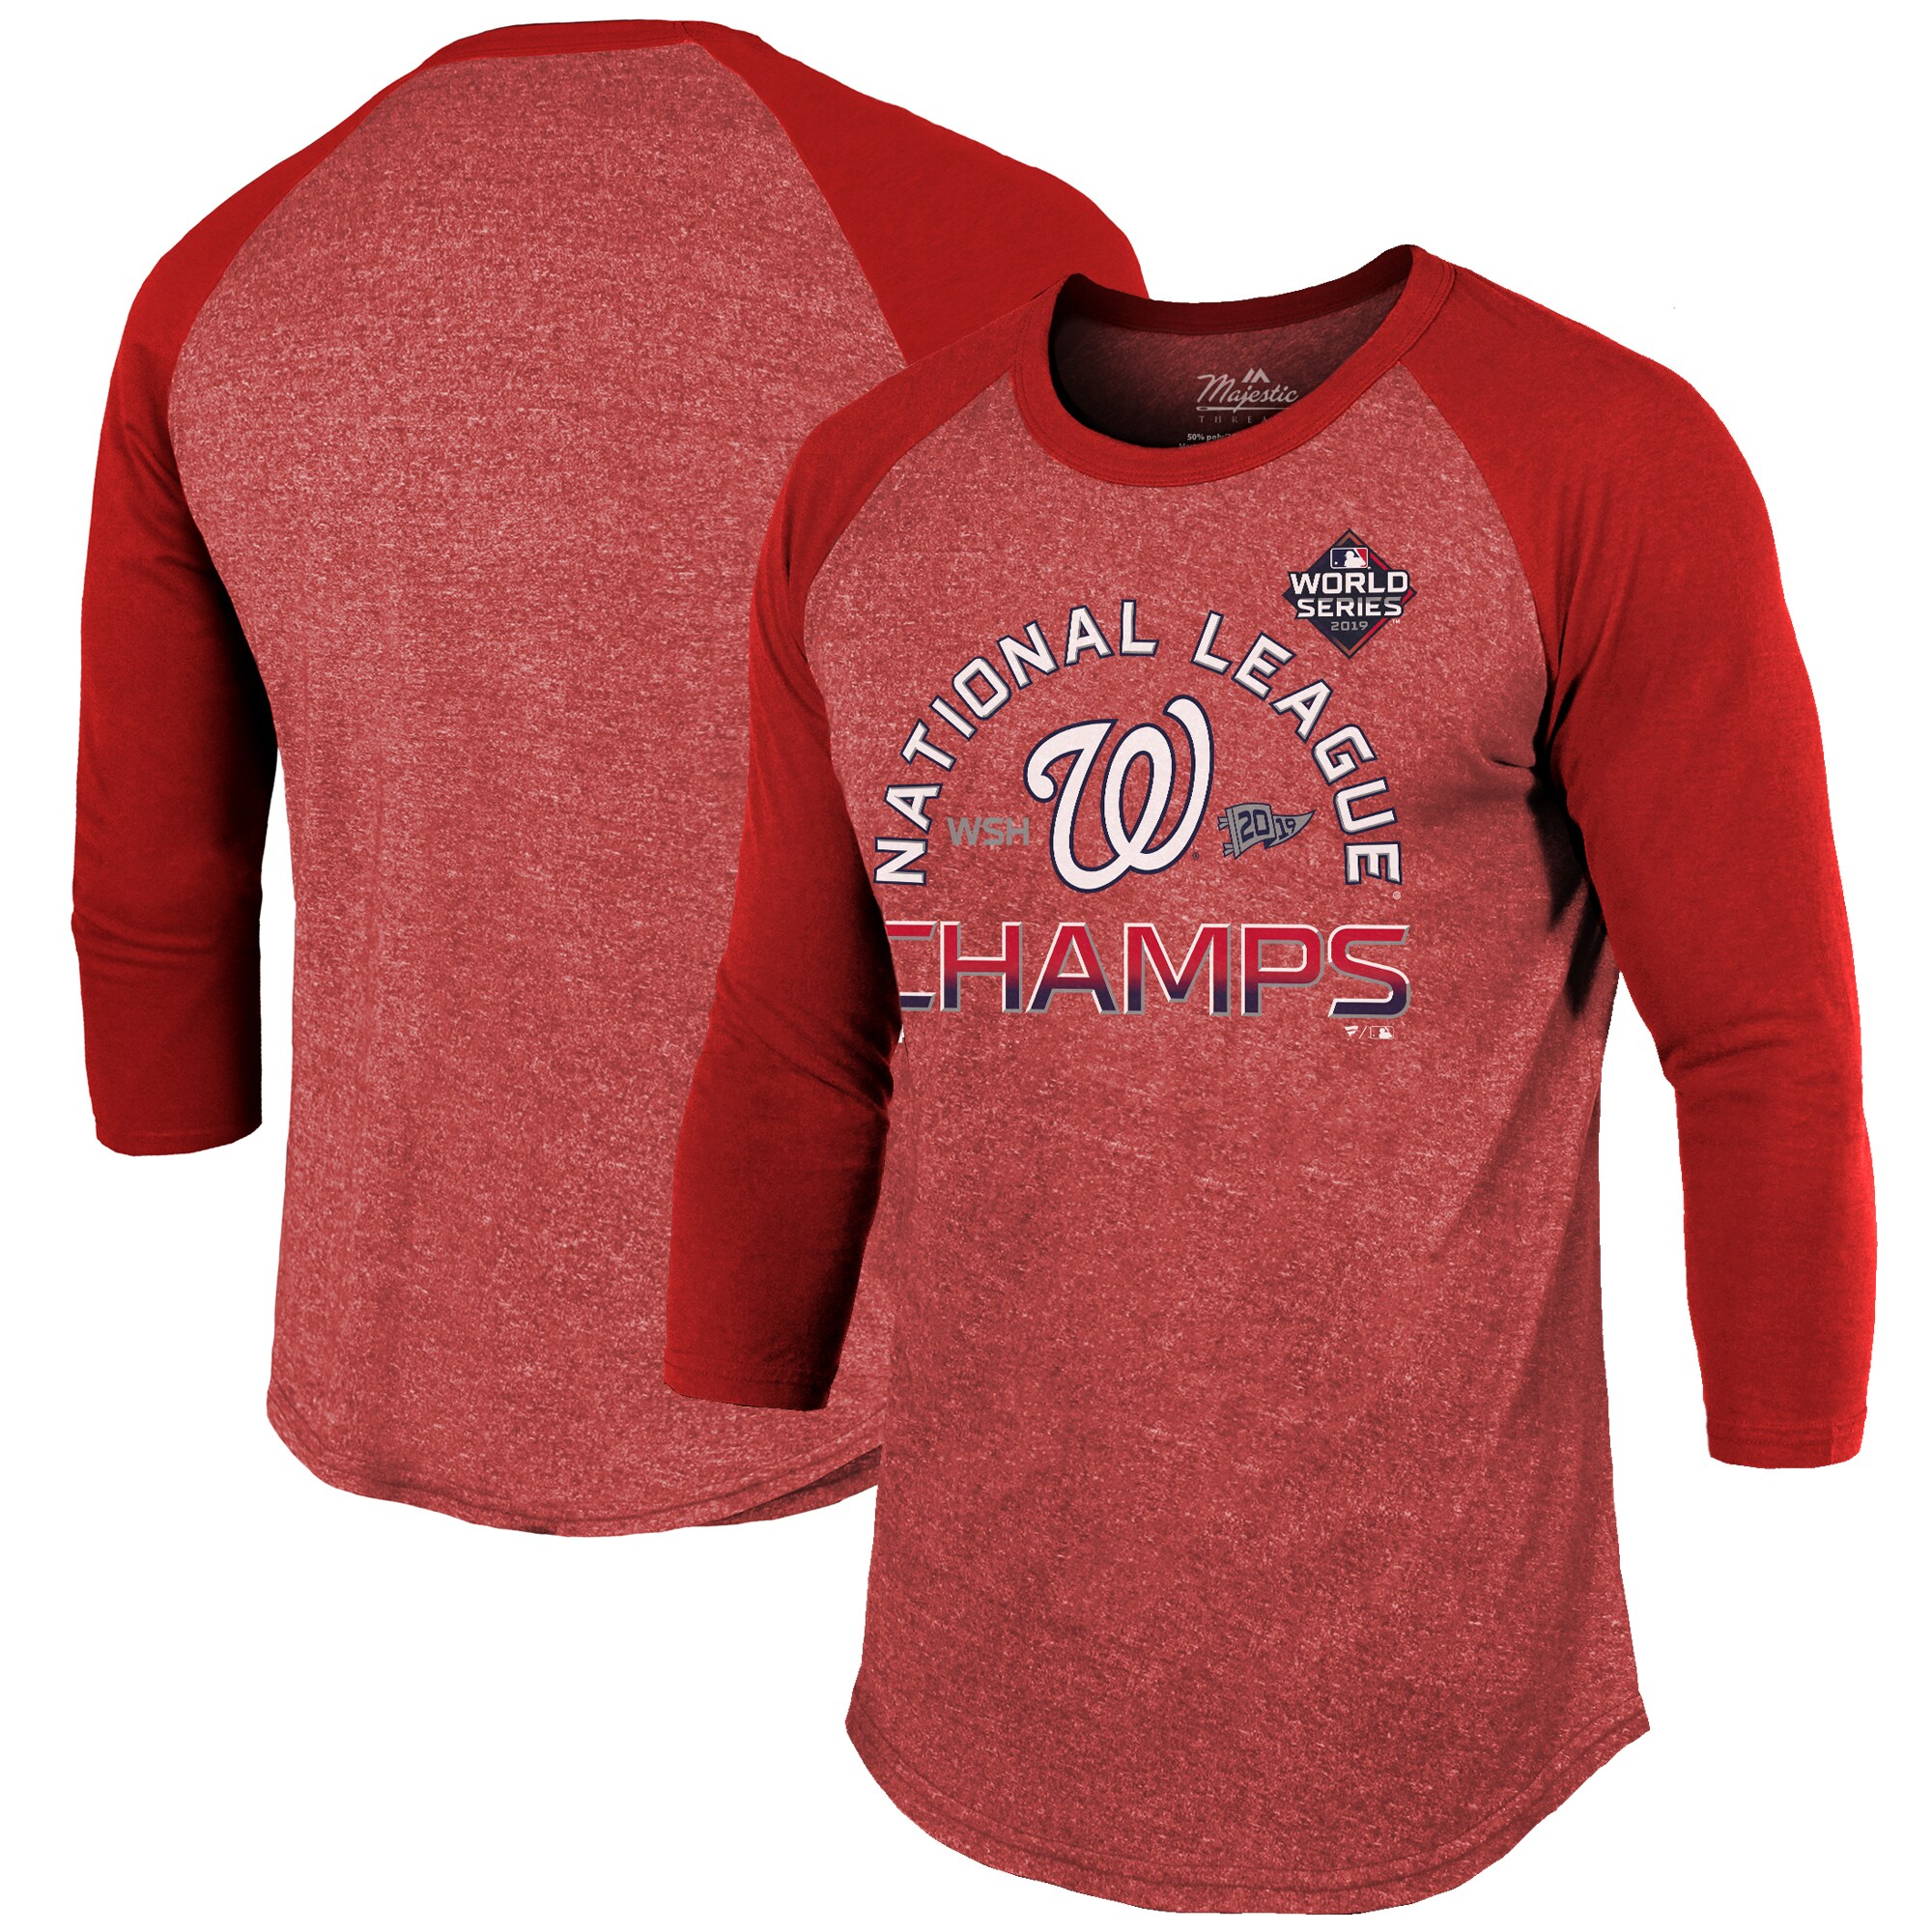 Washington Nationals Majestic Threads 2019 National League Champions Locker Room Raglan 3/4 Sleeve T-Shirt - Red